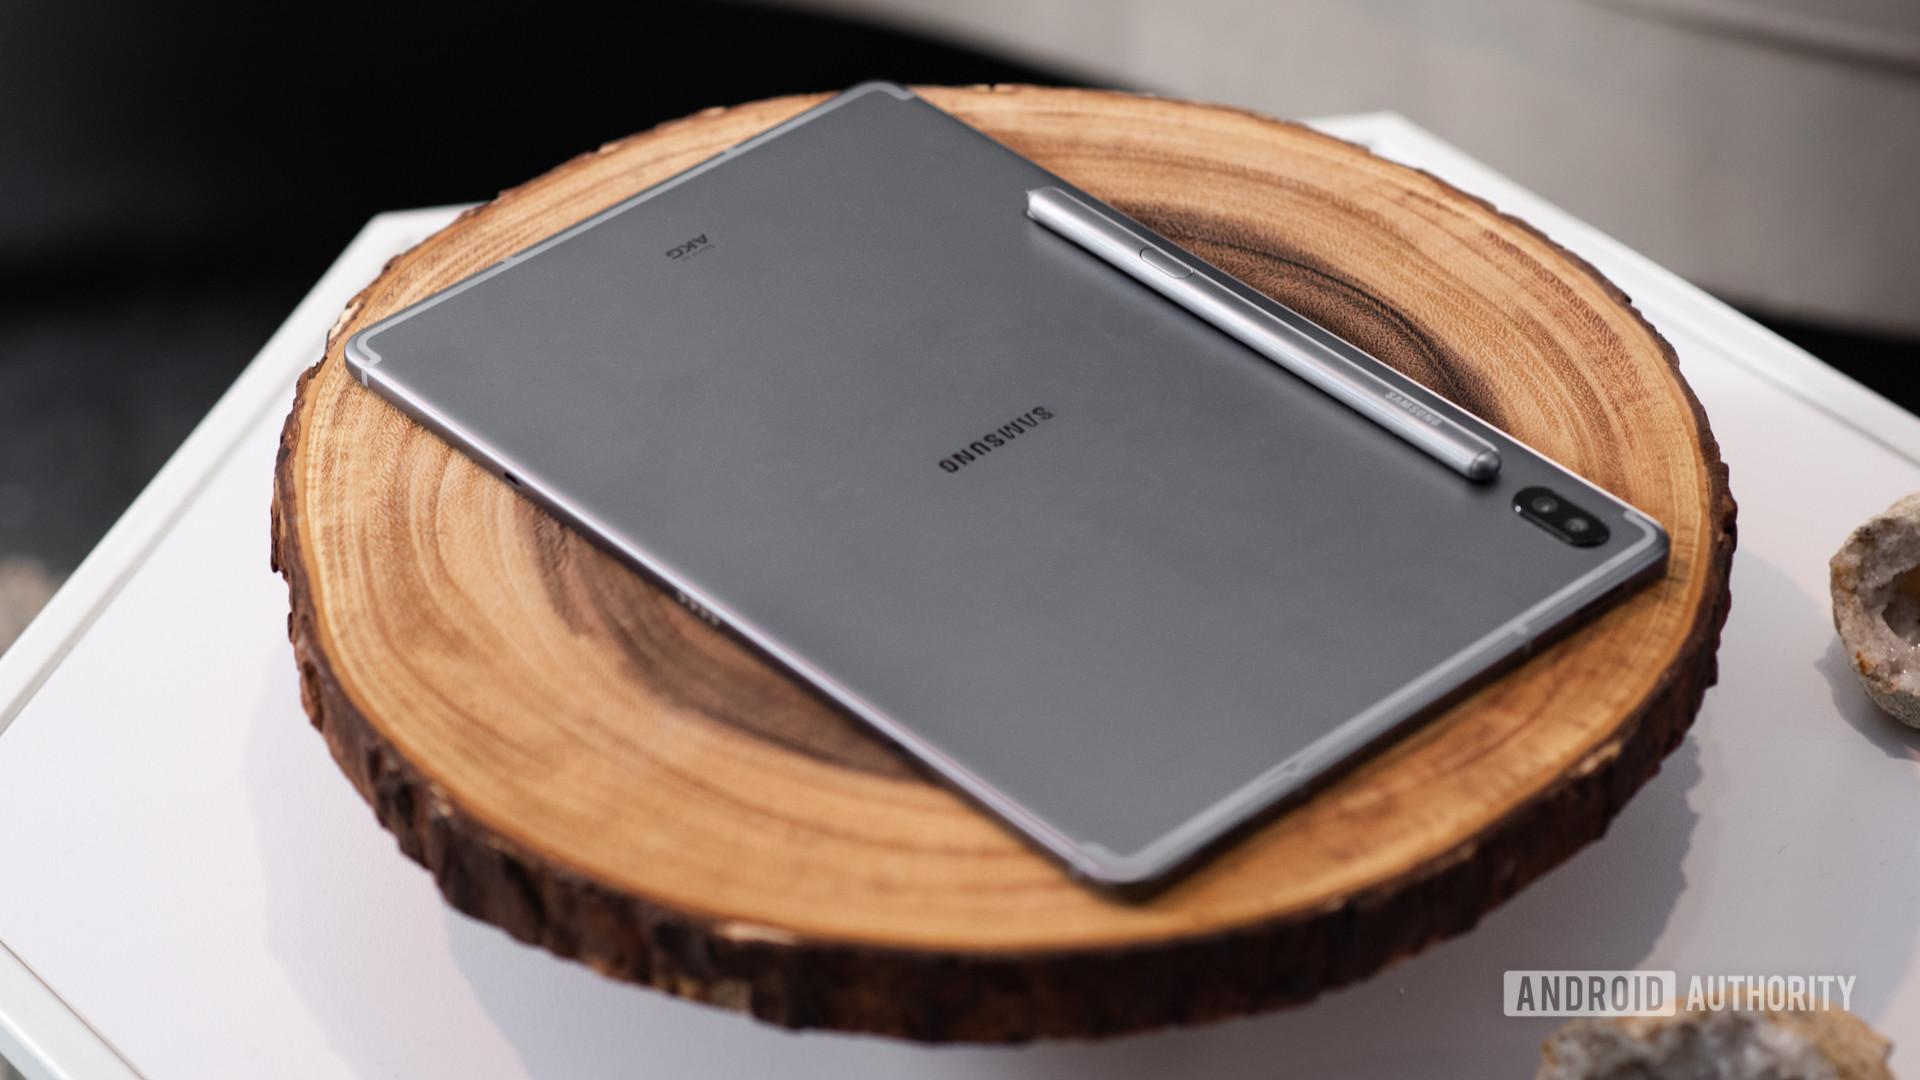 Samsung Galaxy Tab S7 Plus Specs Leak Teasing A Huge Battery